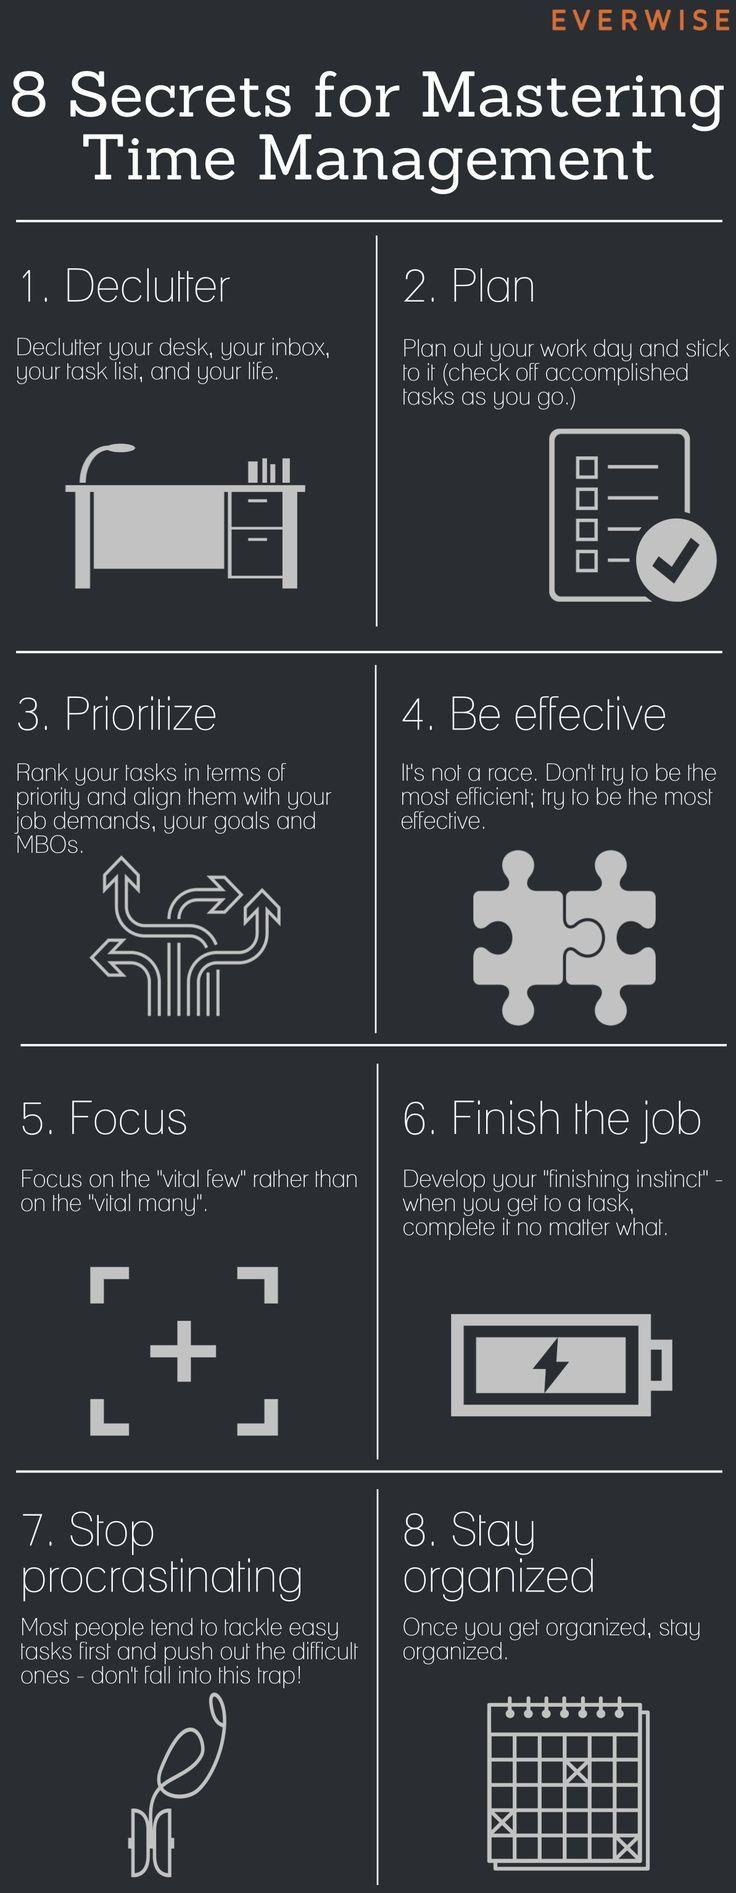 8 key time management tips https://www.geteverwise.com/career-success/infographic-8-secrets-for-mastering-time-management/